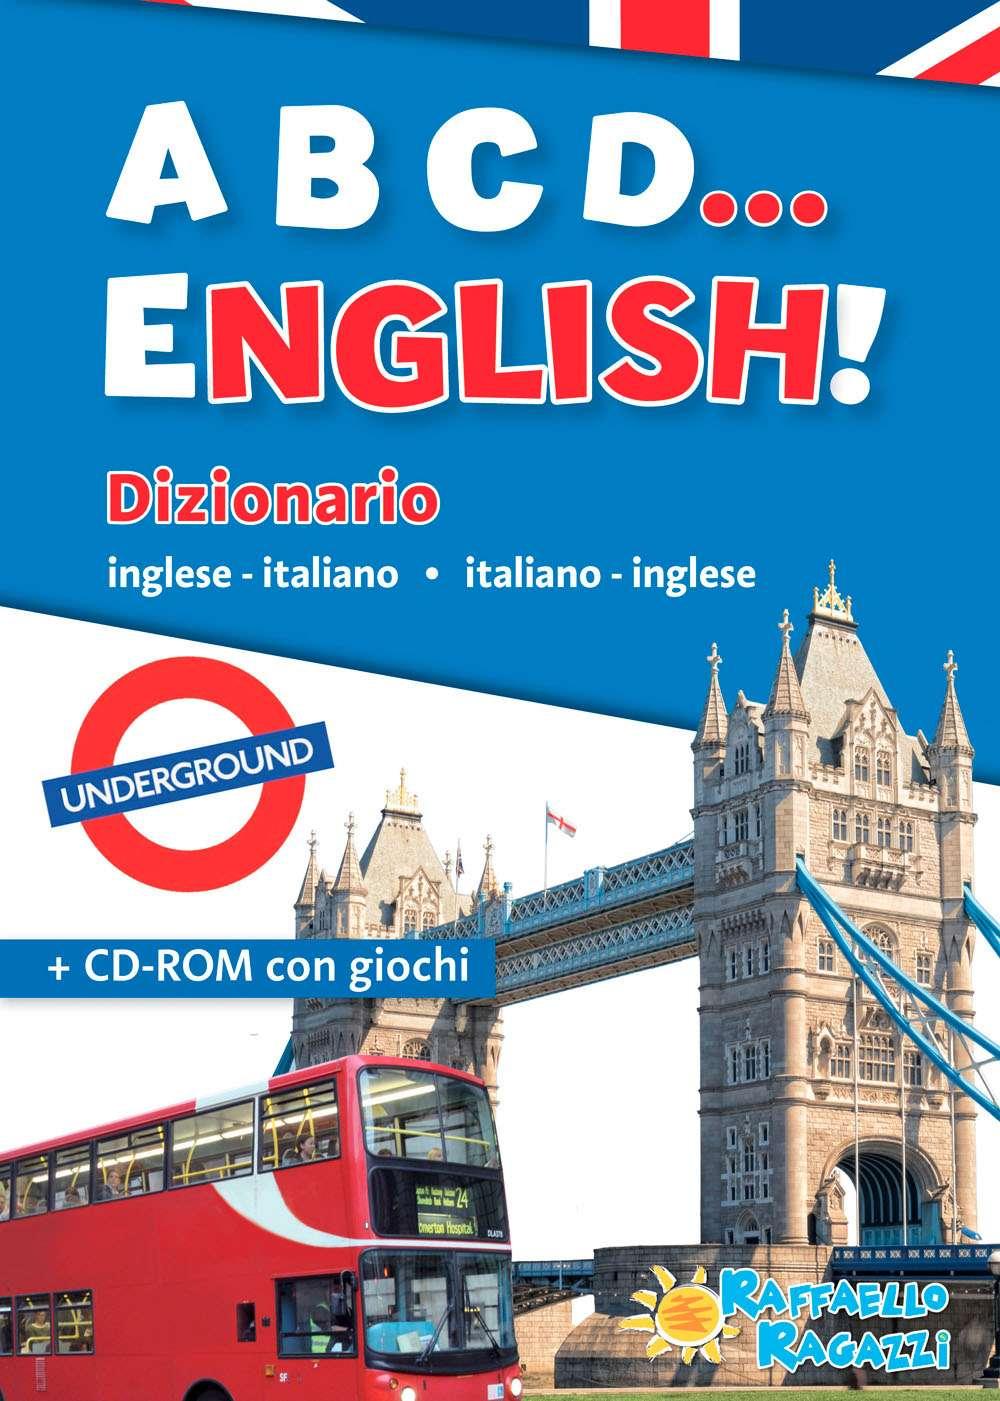 ABCD... English!